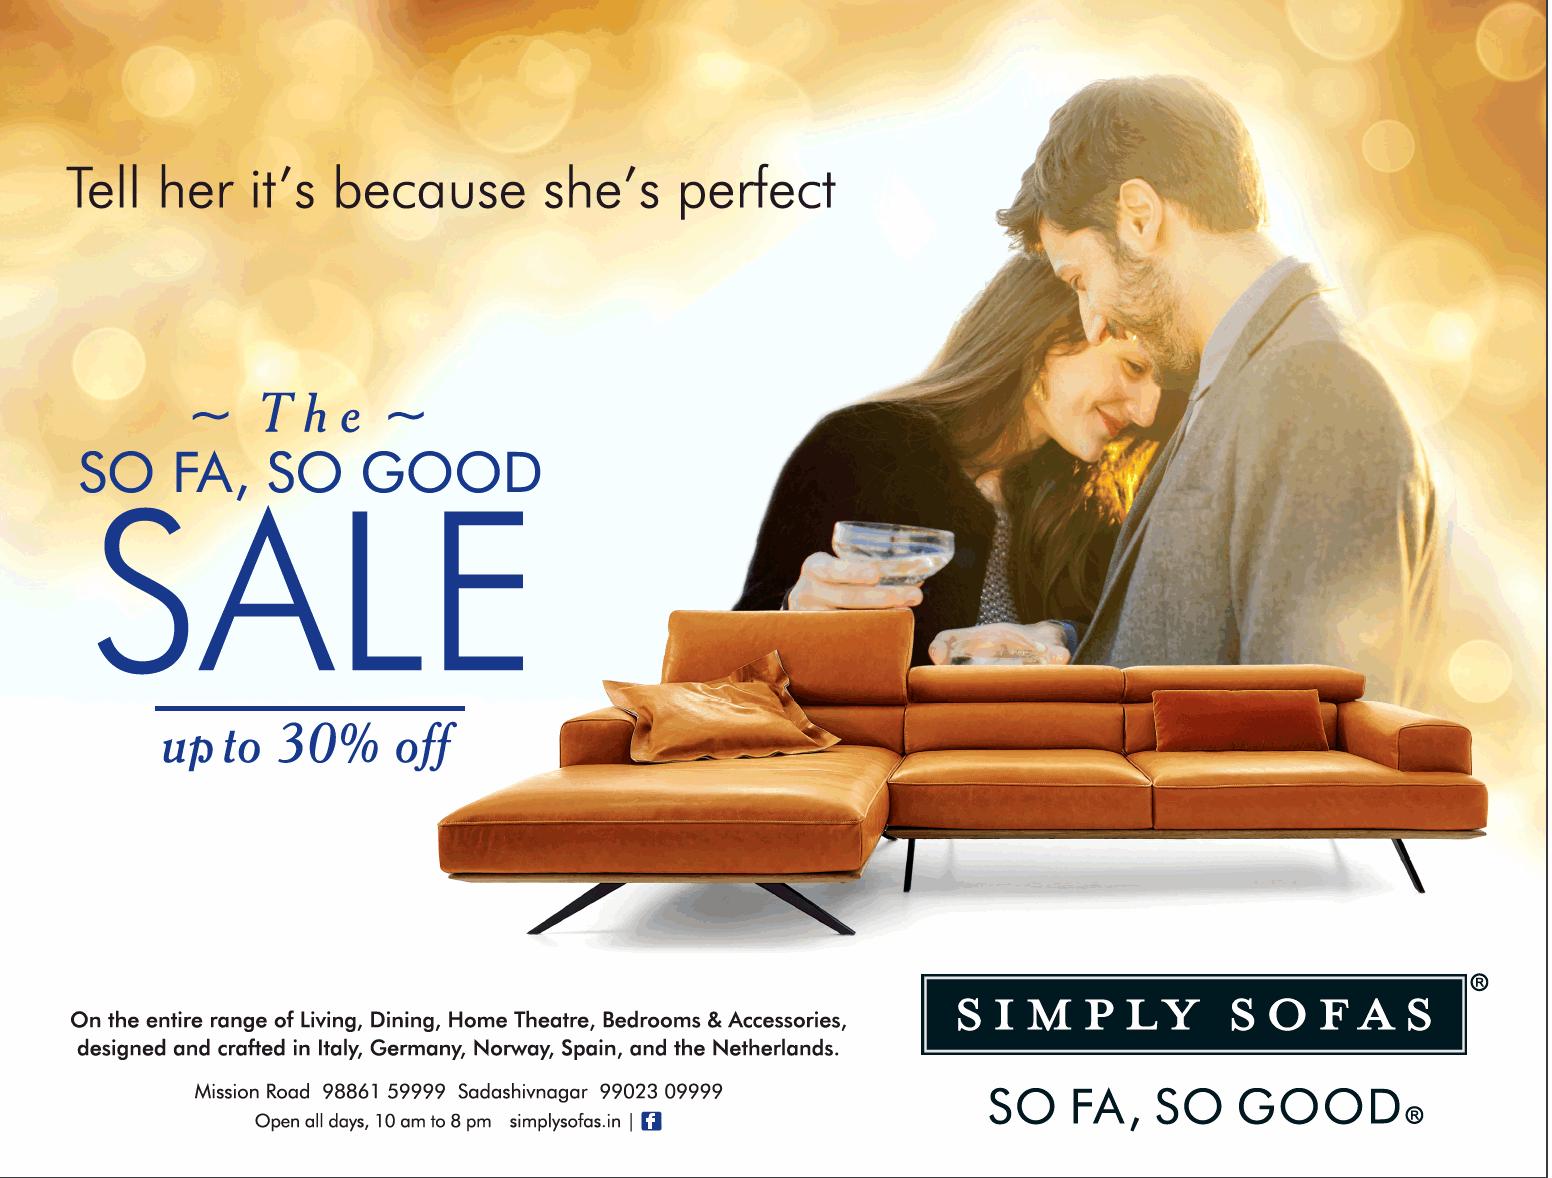 Simply Sofas So Fa Good Upto 30 Off Ad